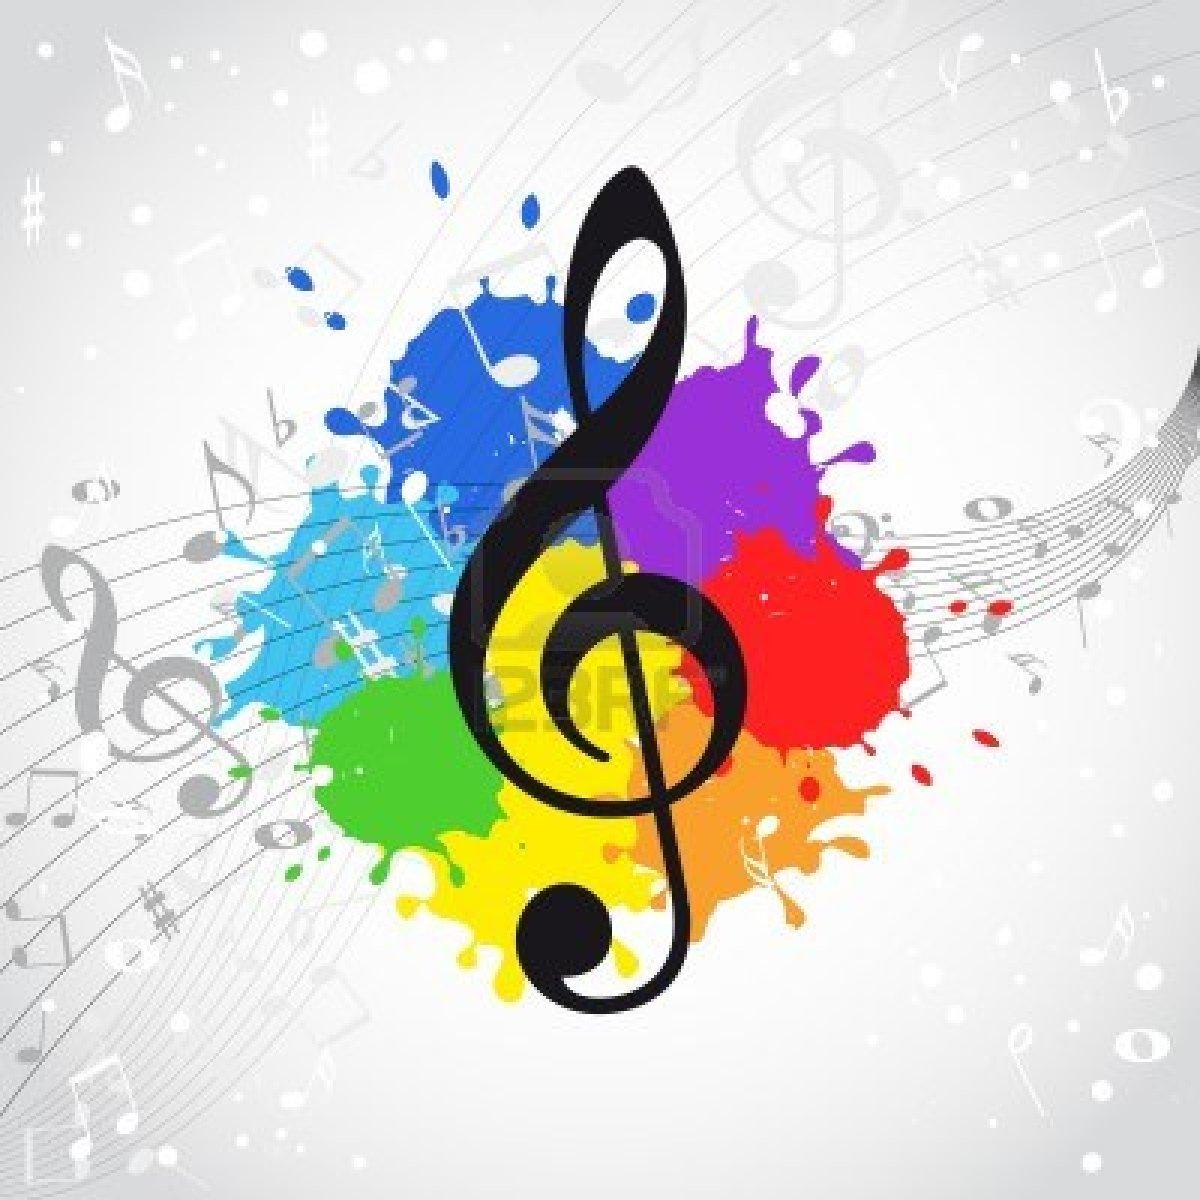 musica, red cultivarsalud